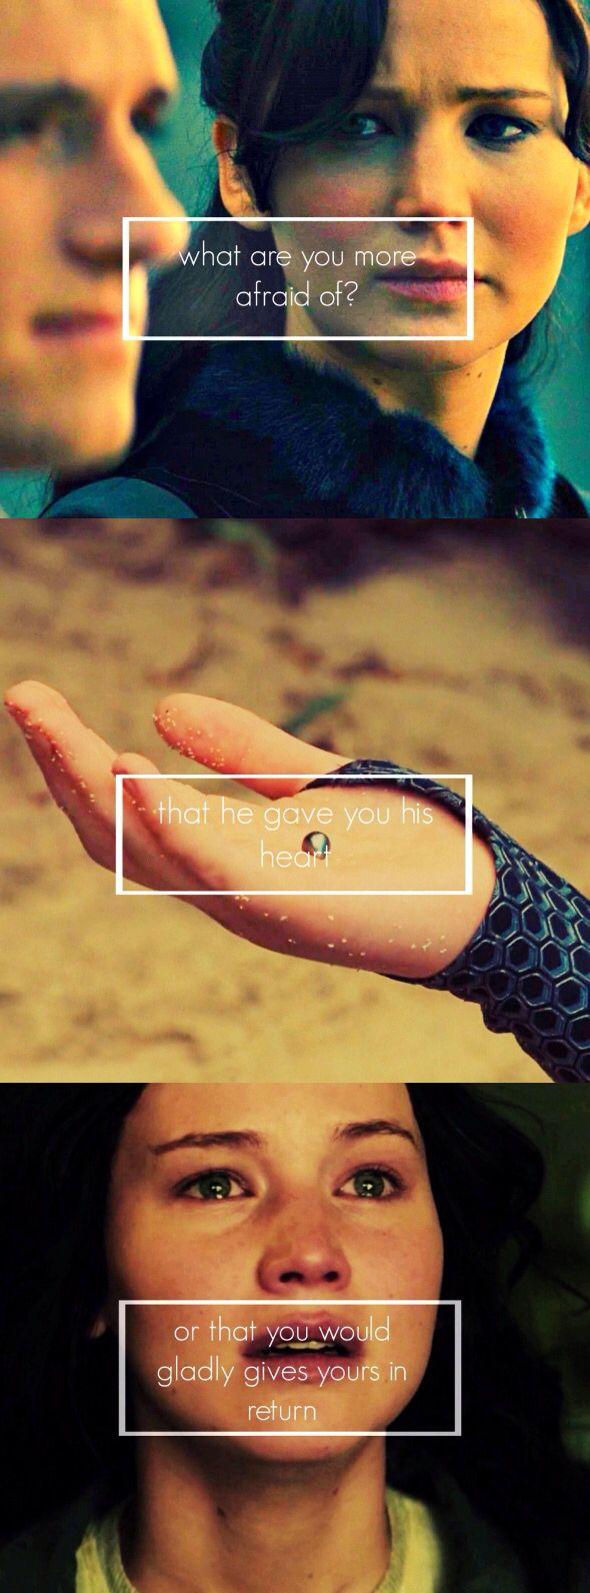 #TheHungerGames #CatchingFire - Katniss & Peeta